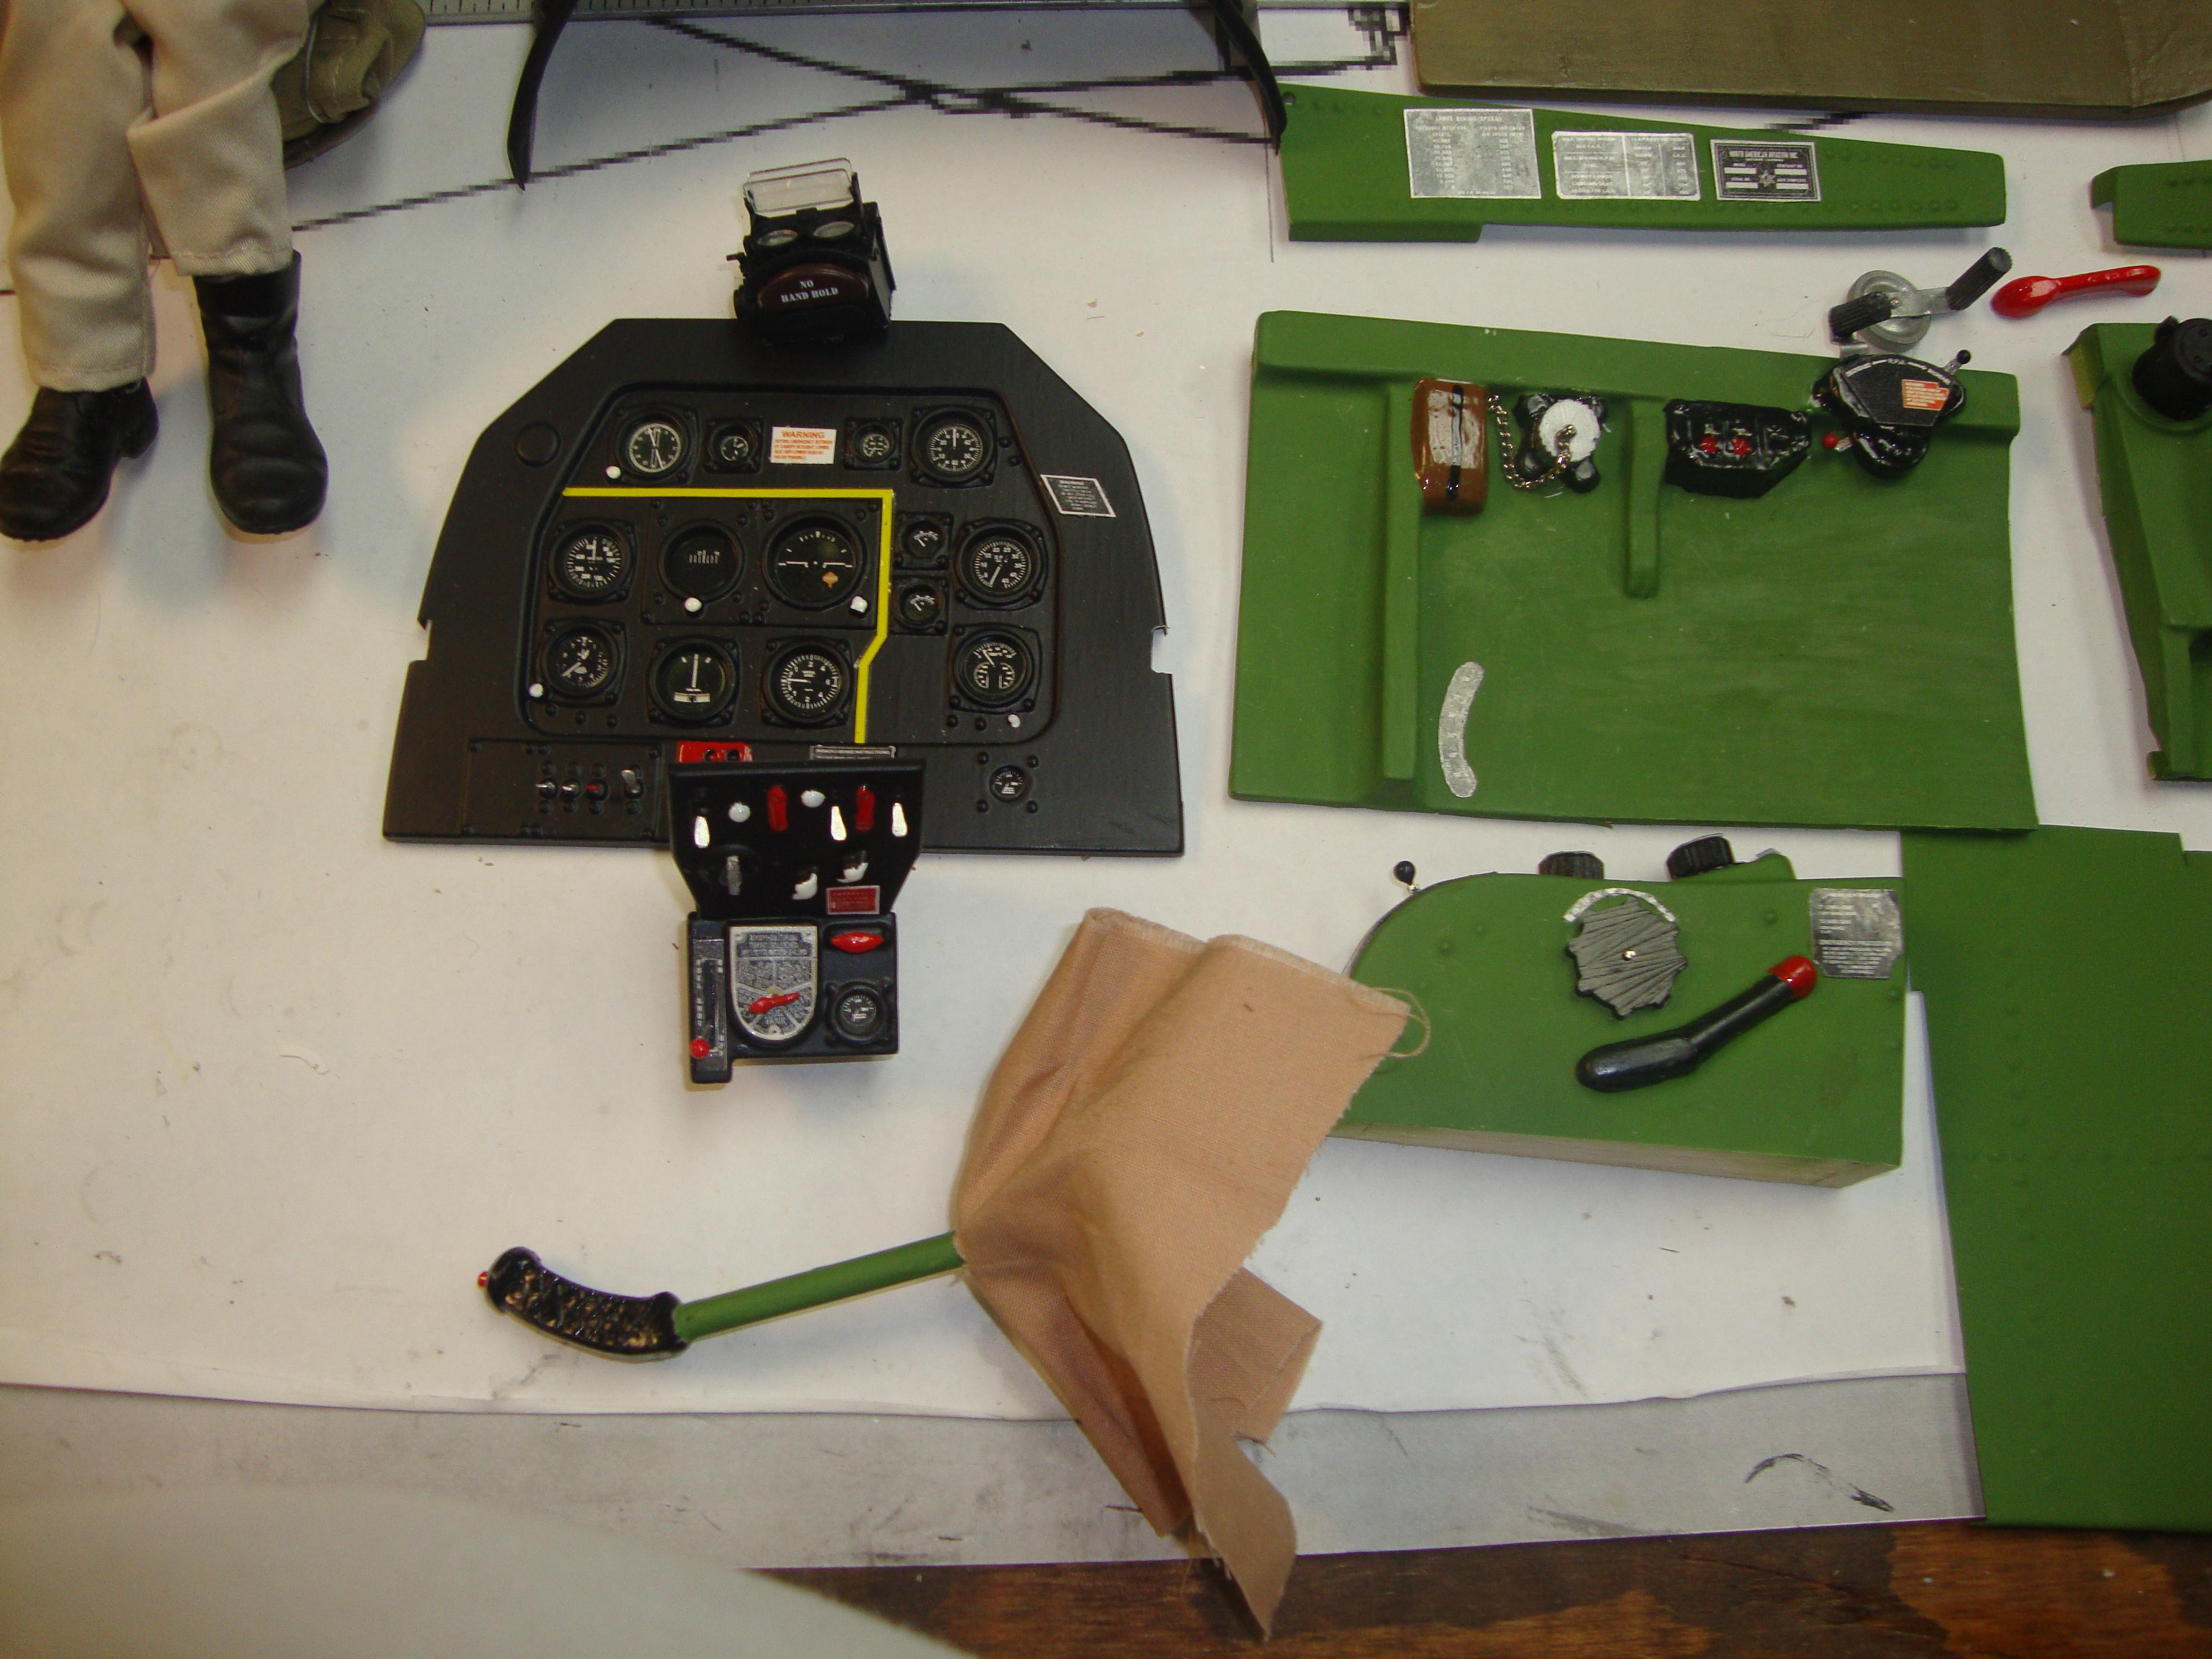 Click image for larger version  Name:I8 Cockpit.JPG Views:67 Size:4.00 MB ID:2134113